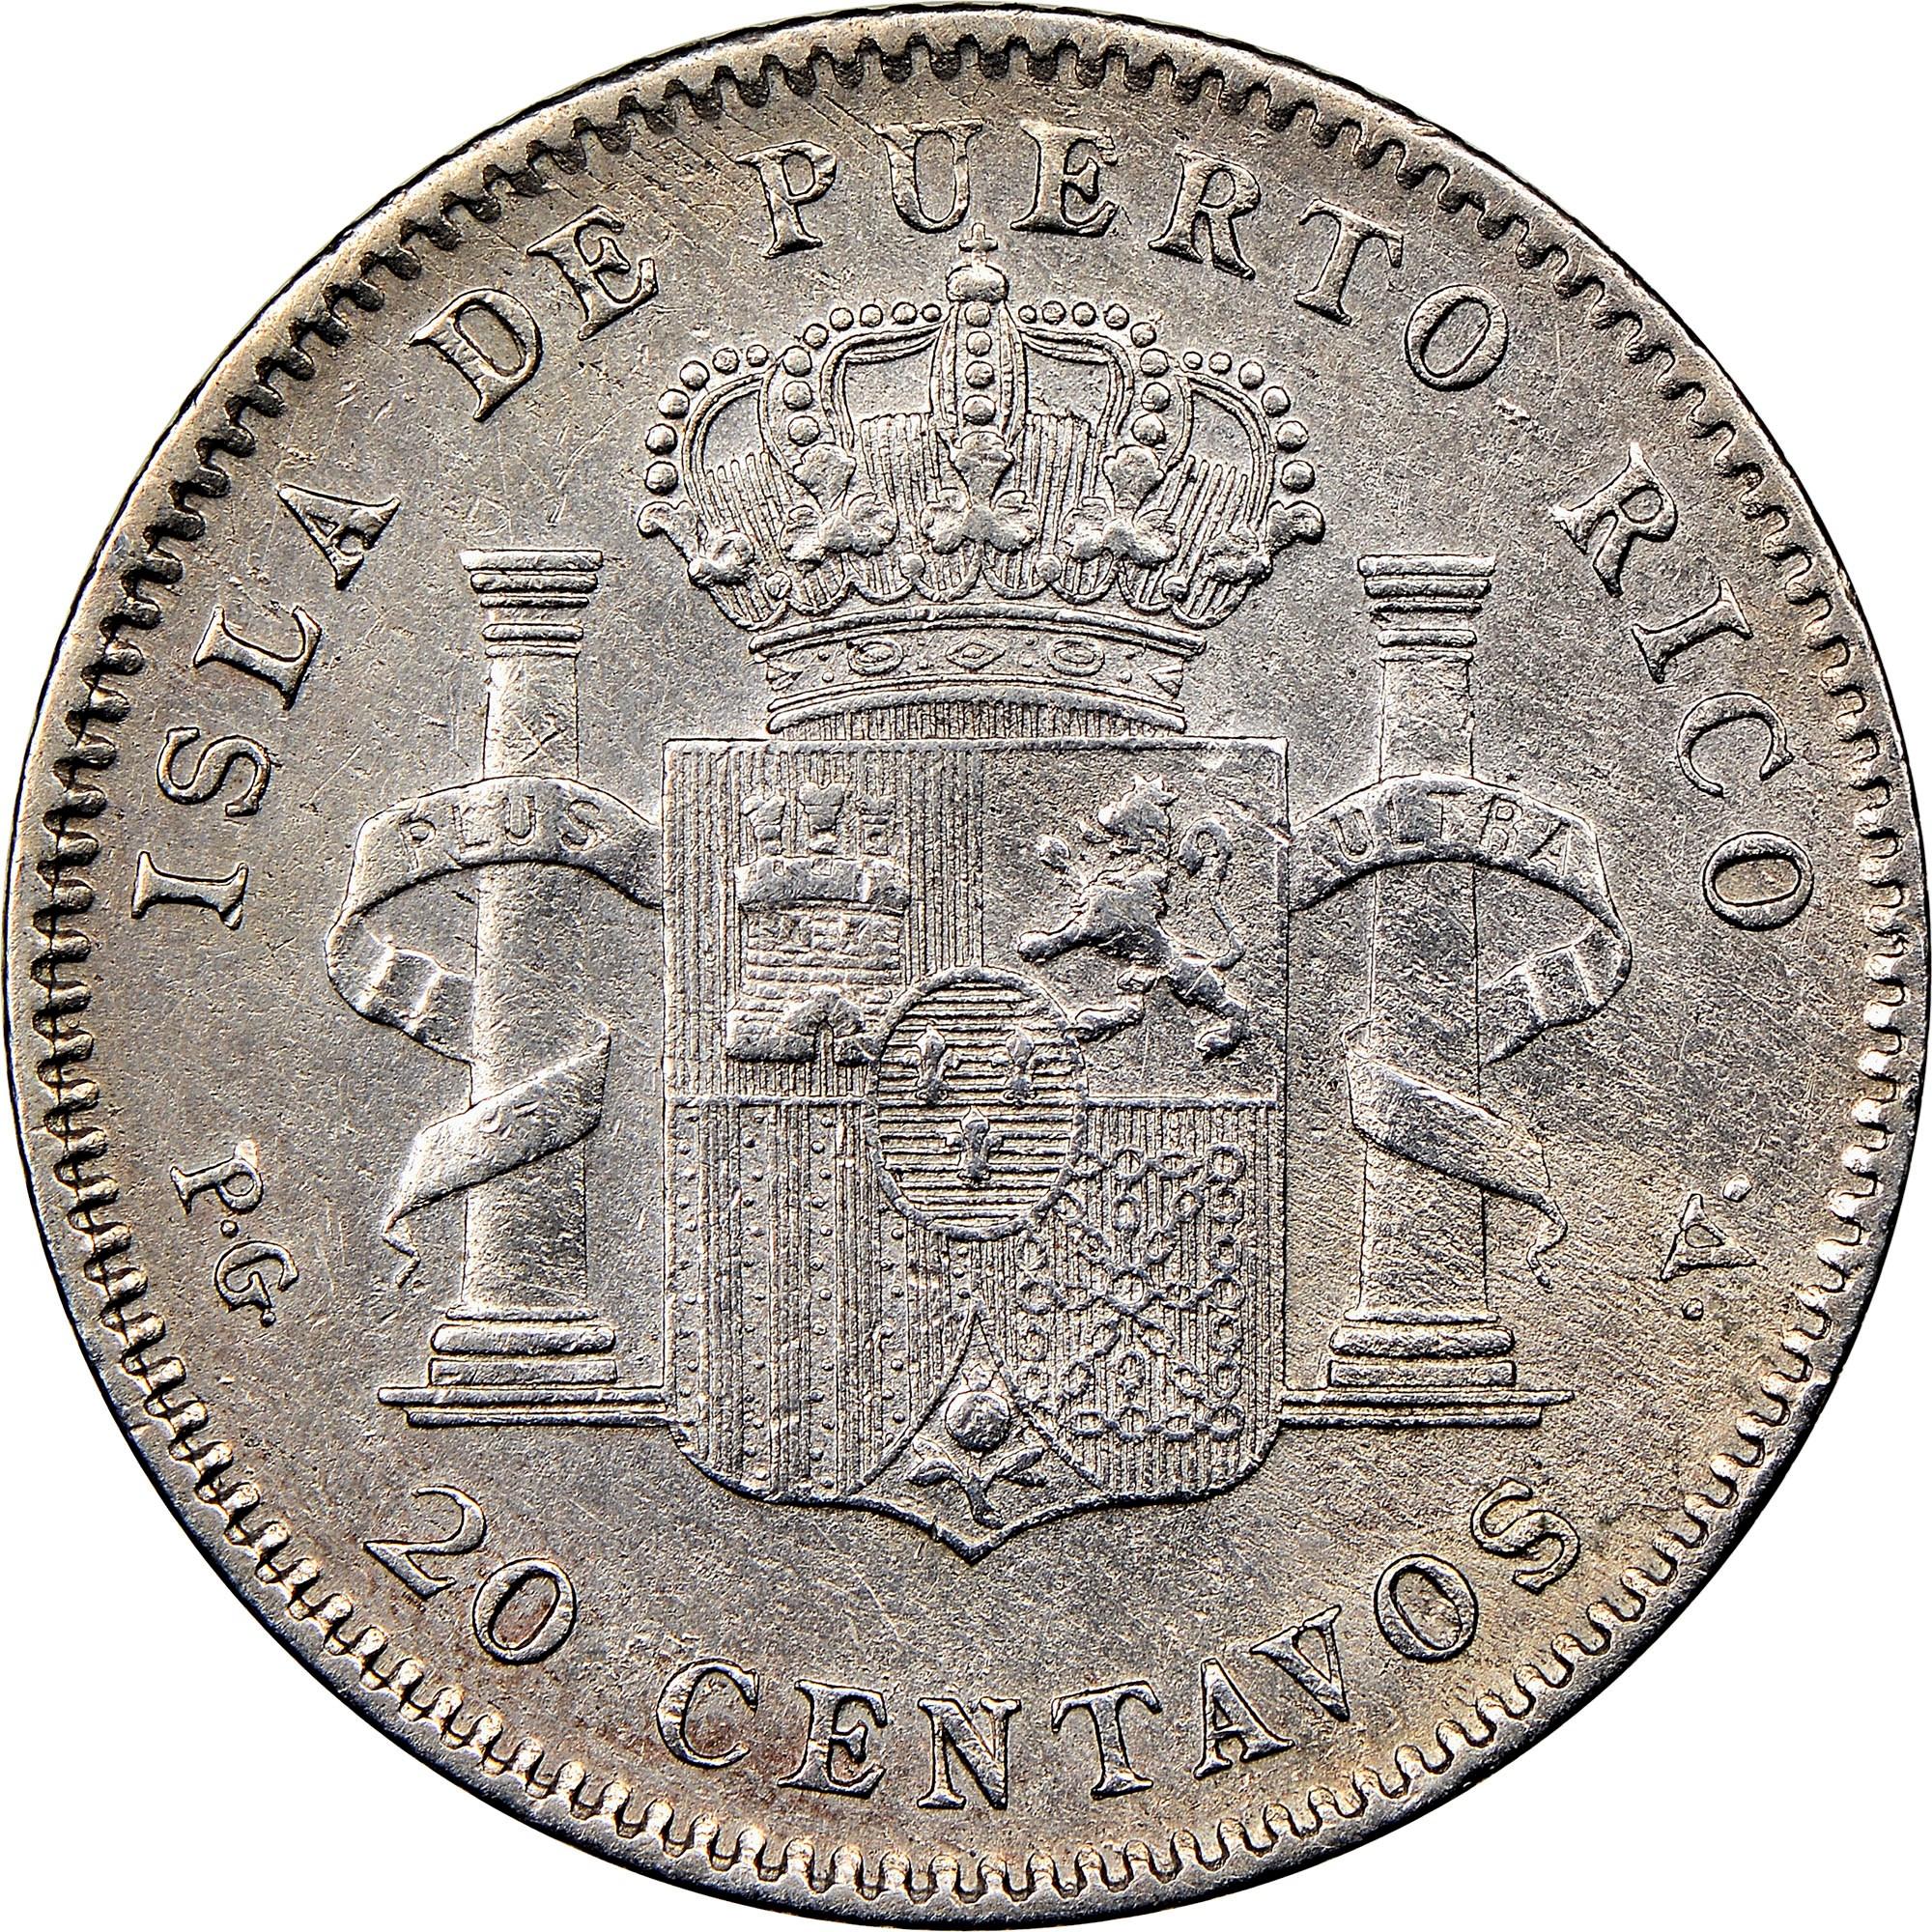 Puerto Rico 20 Centavos reverse